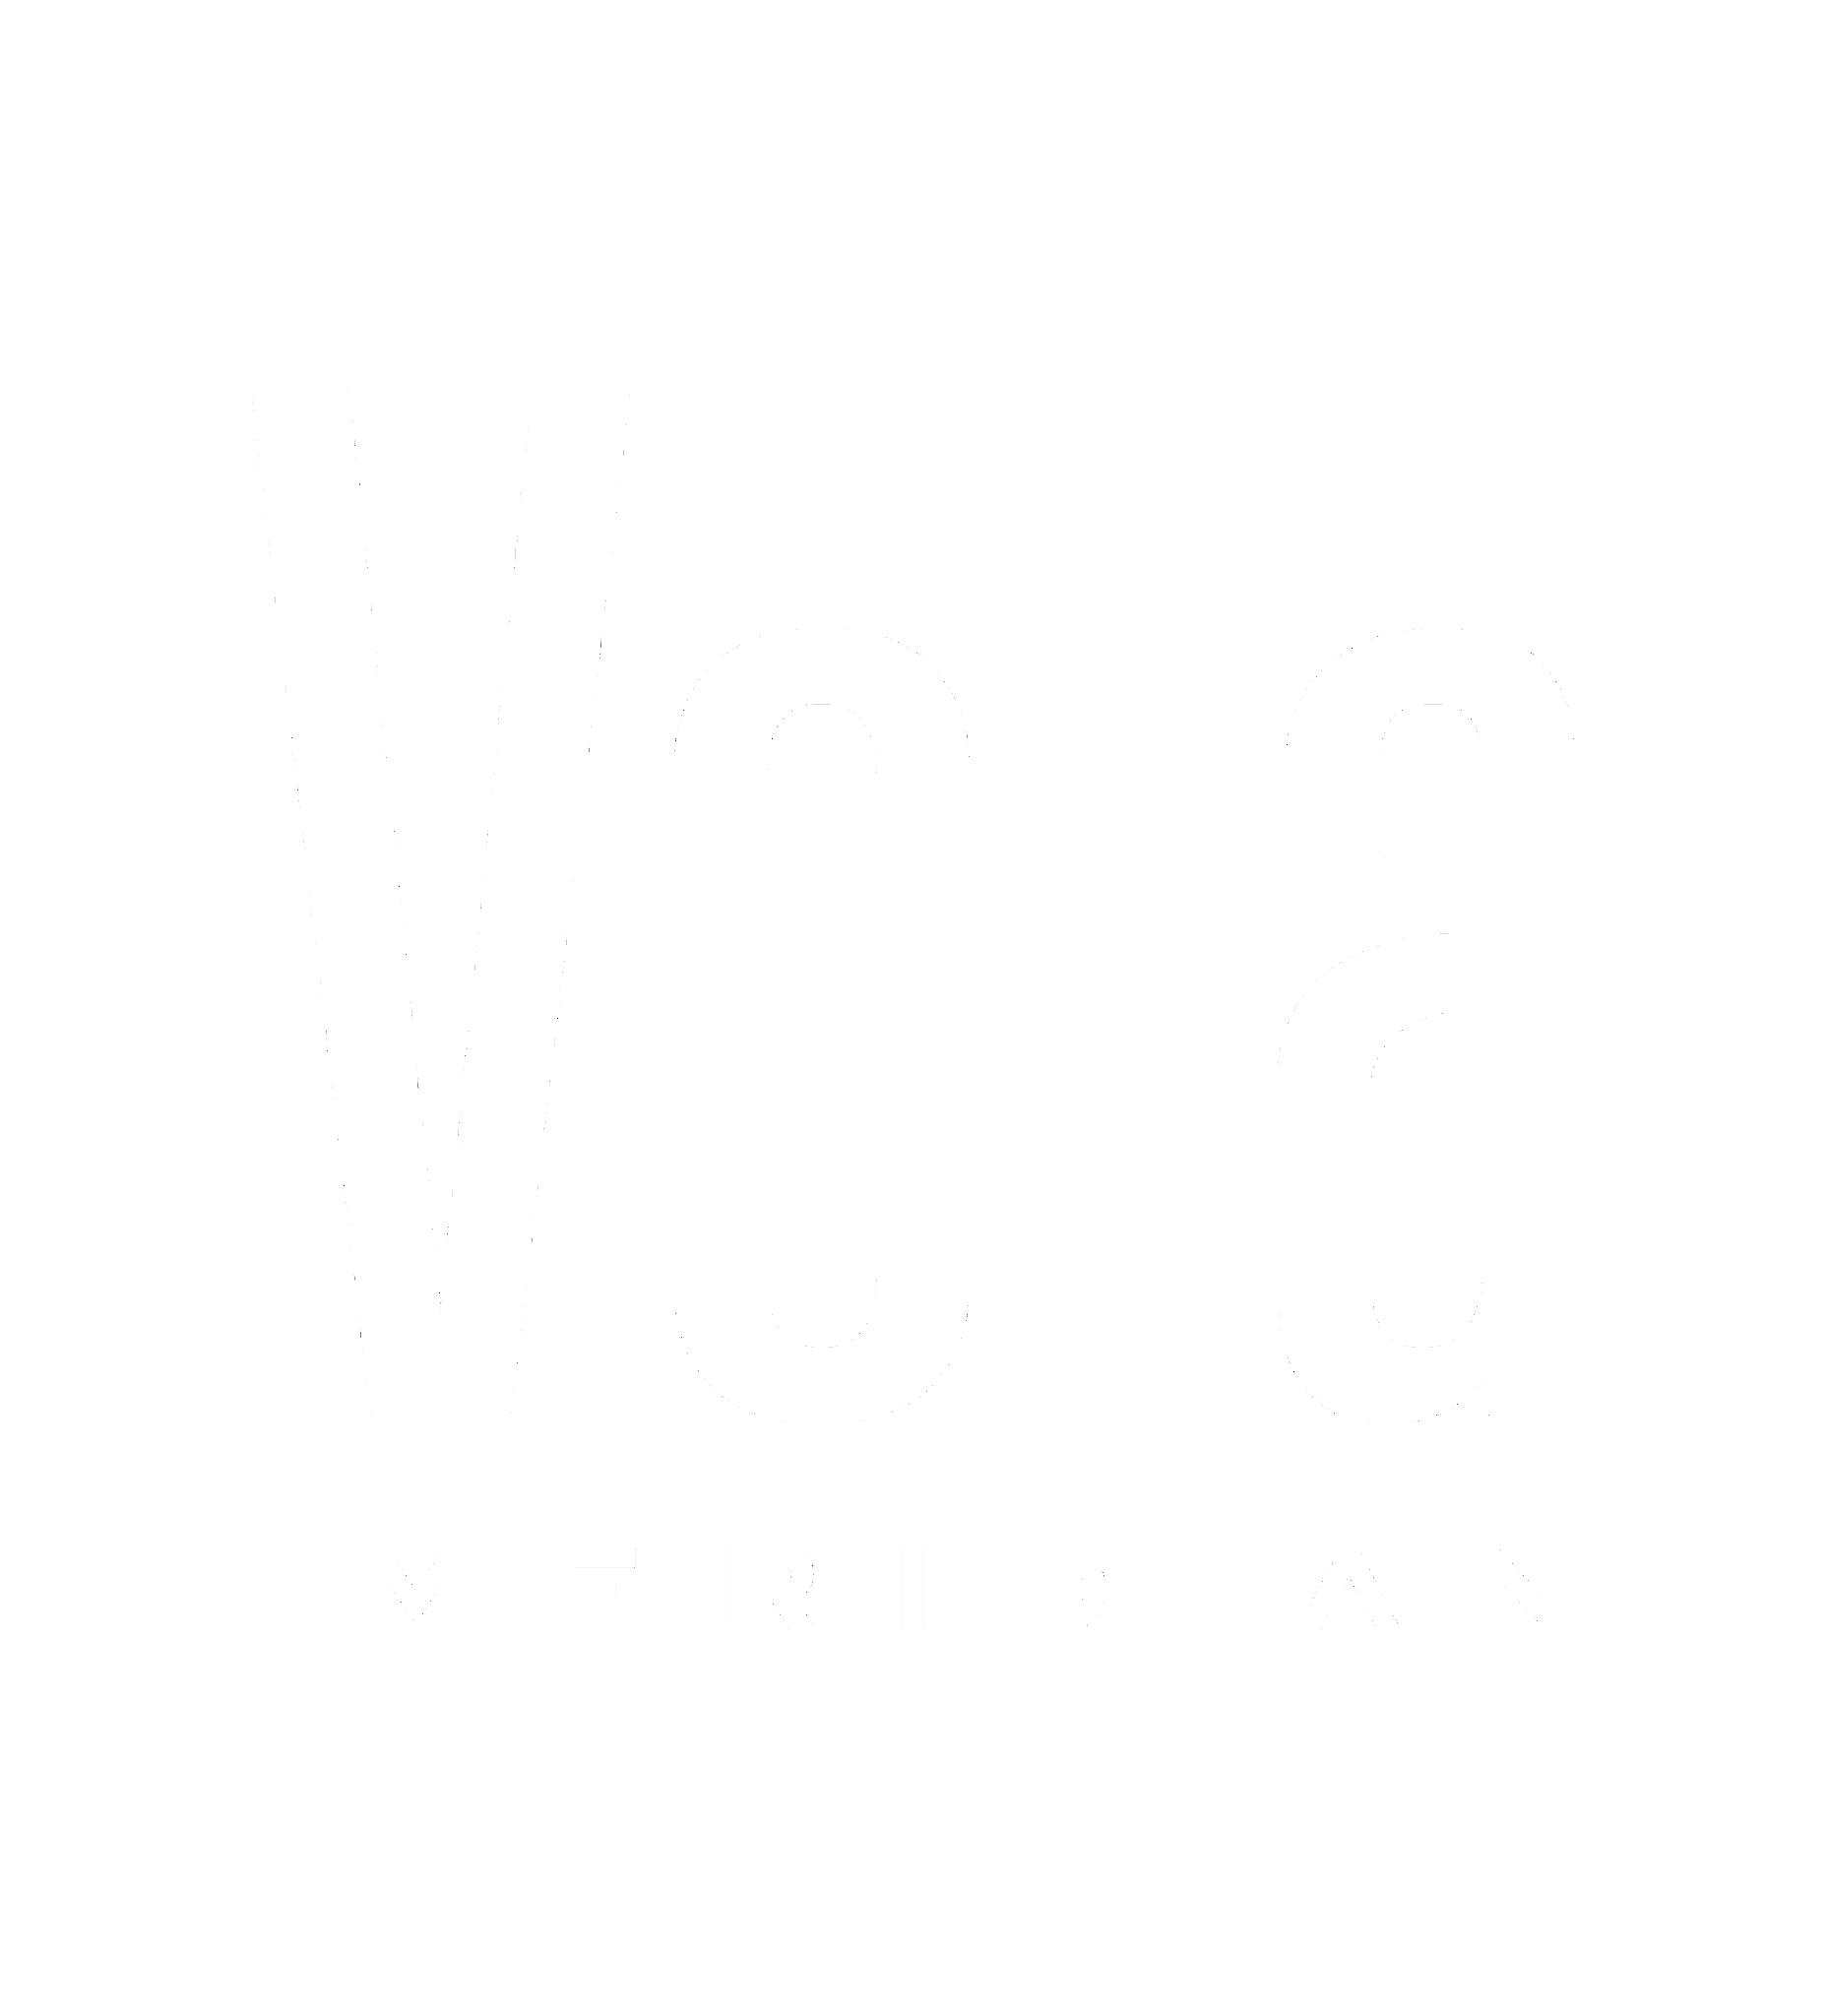 Vela Meridian Apartments